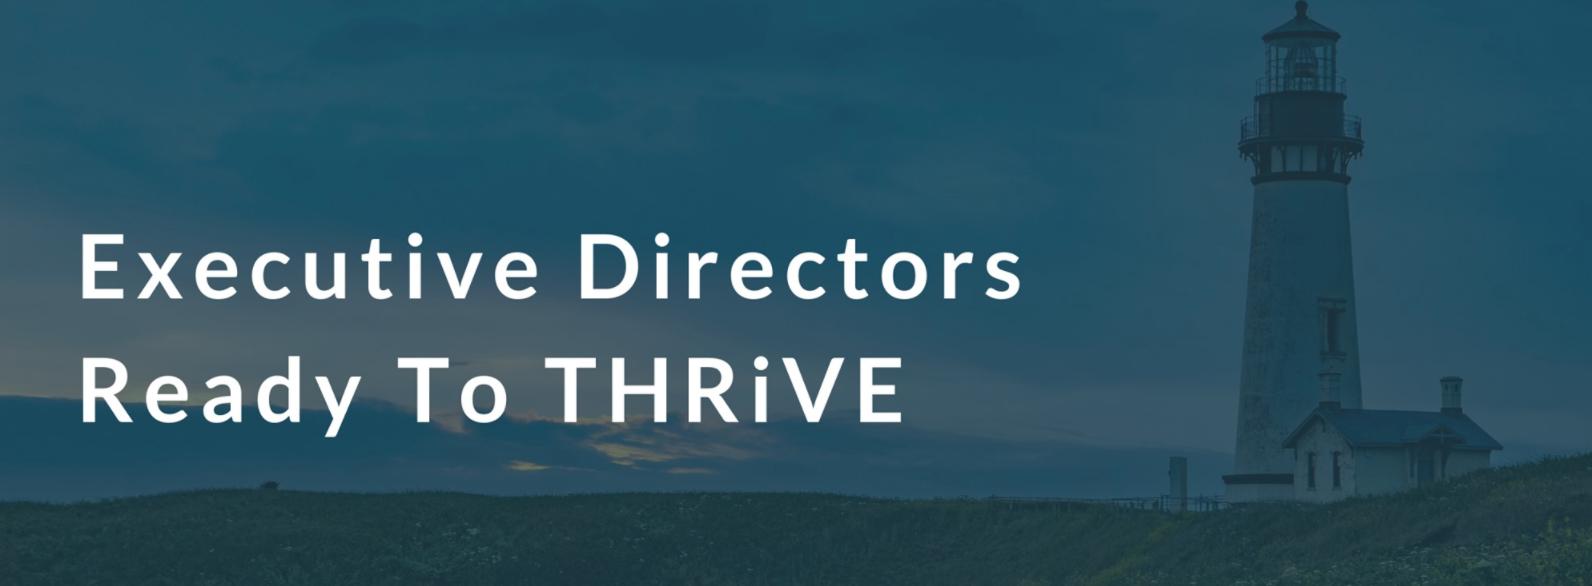 executive directors facebook group